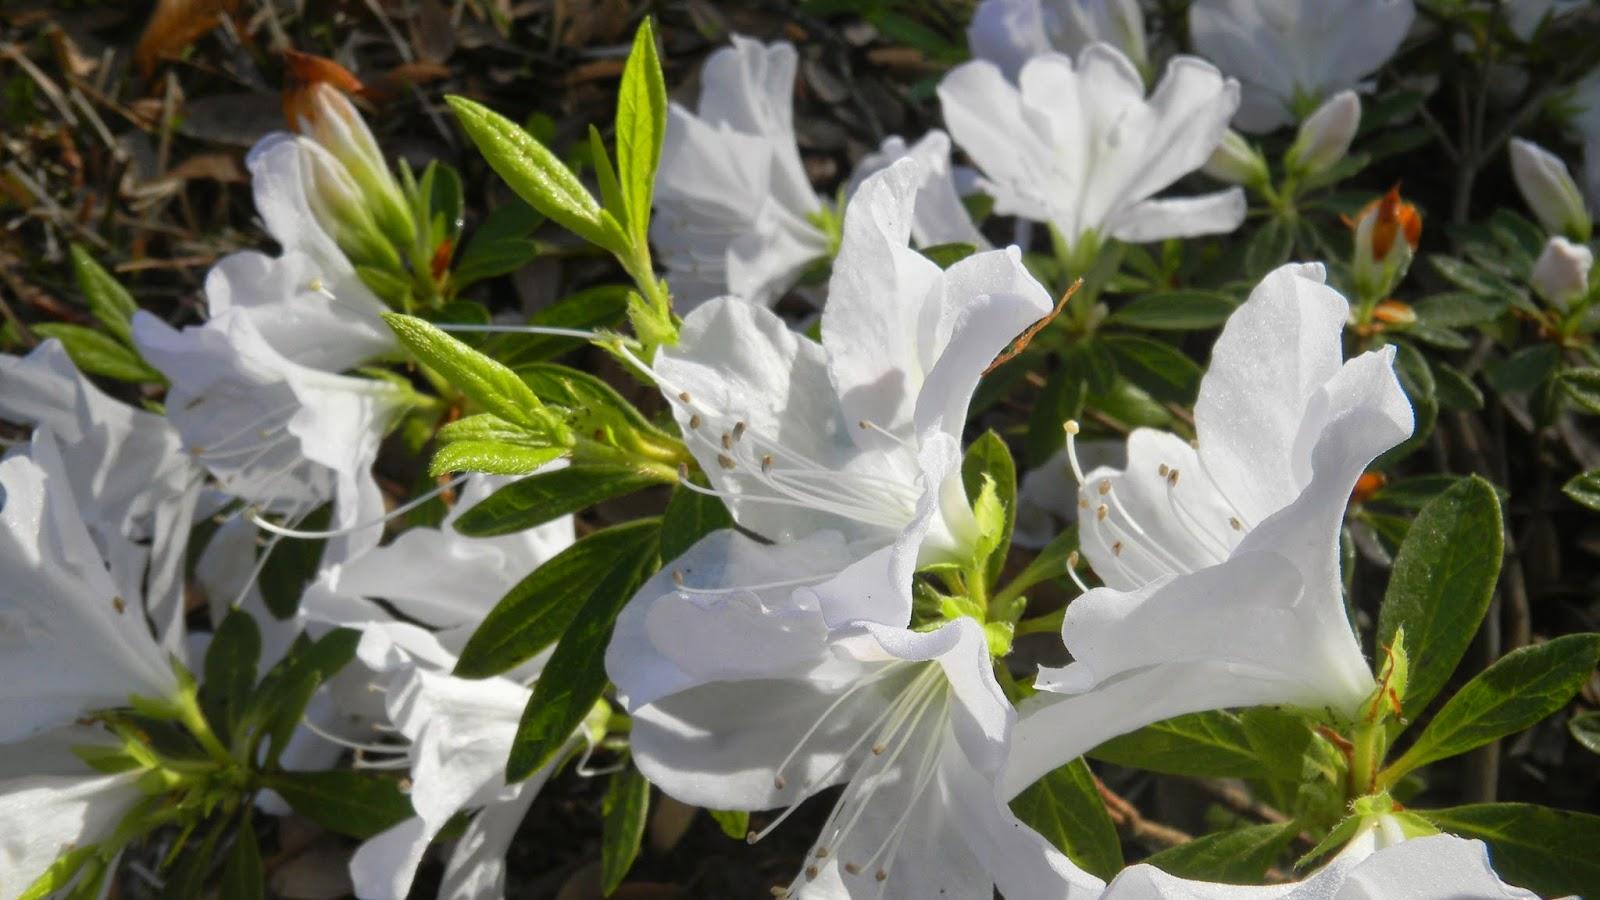 Mrs. G. G. Gerbing azalea